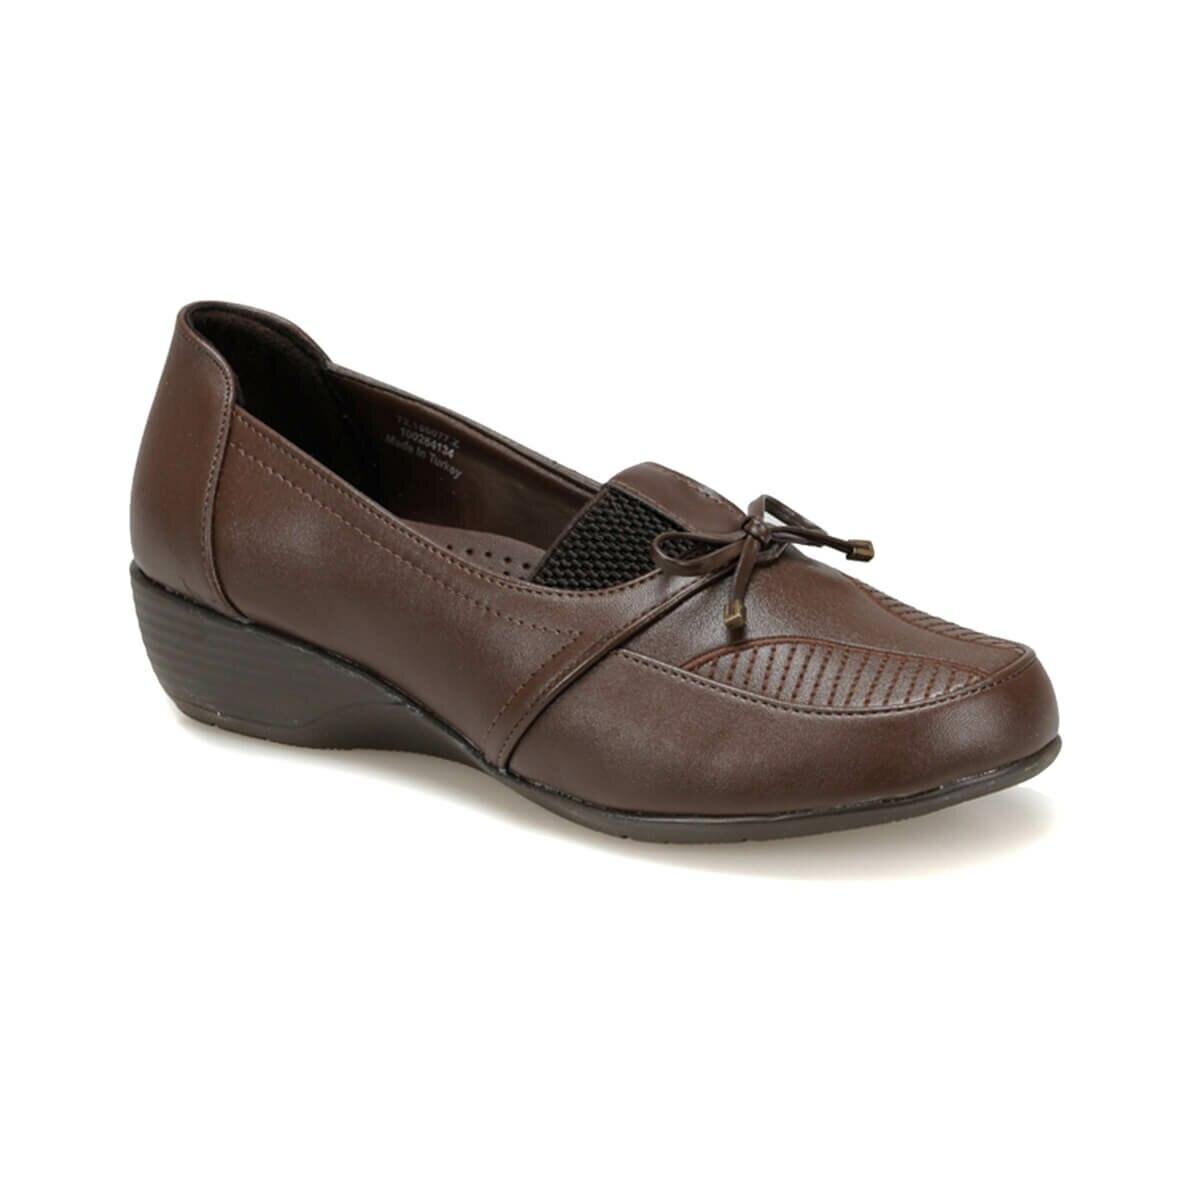 FLO 72.156077.Z Brown Women 'S Shoes Polaris